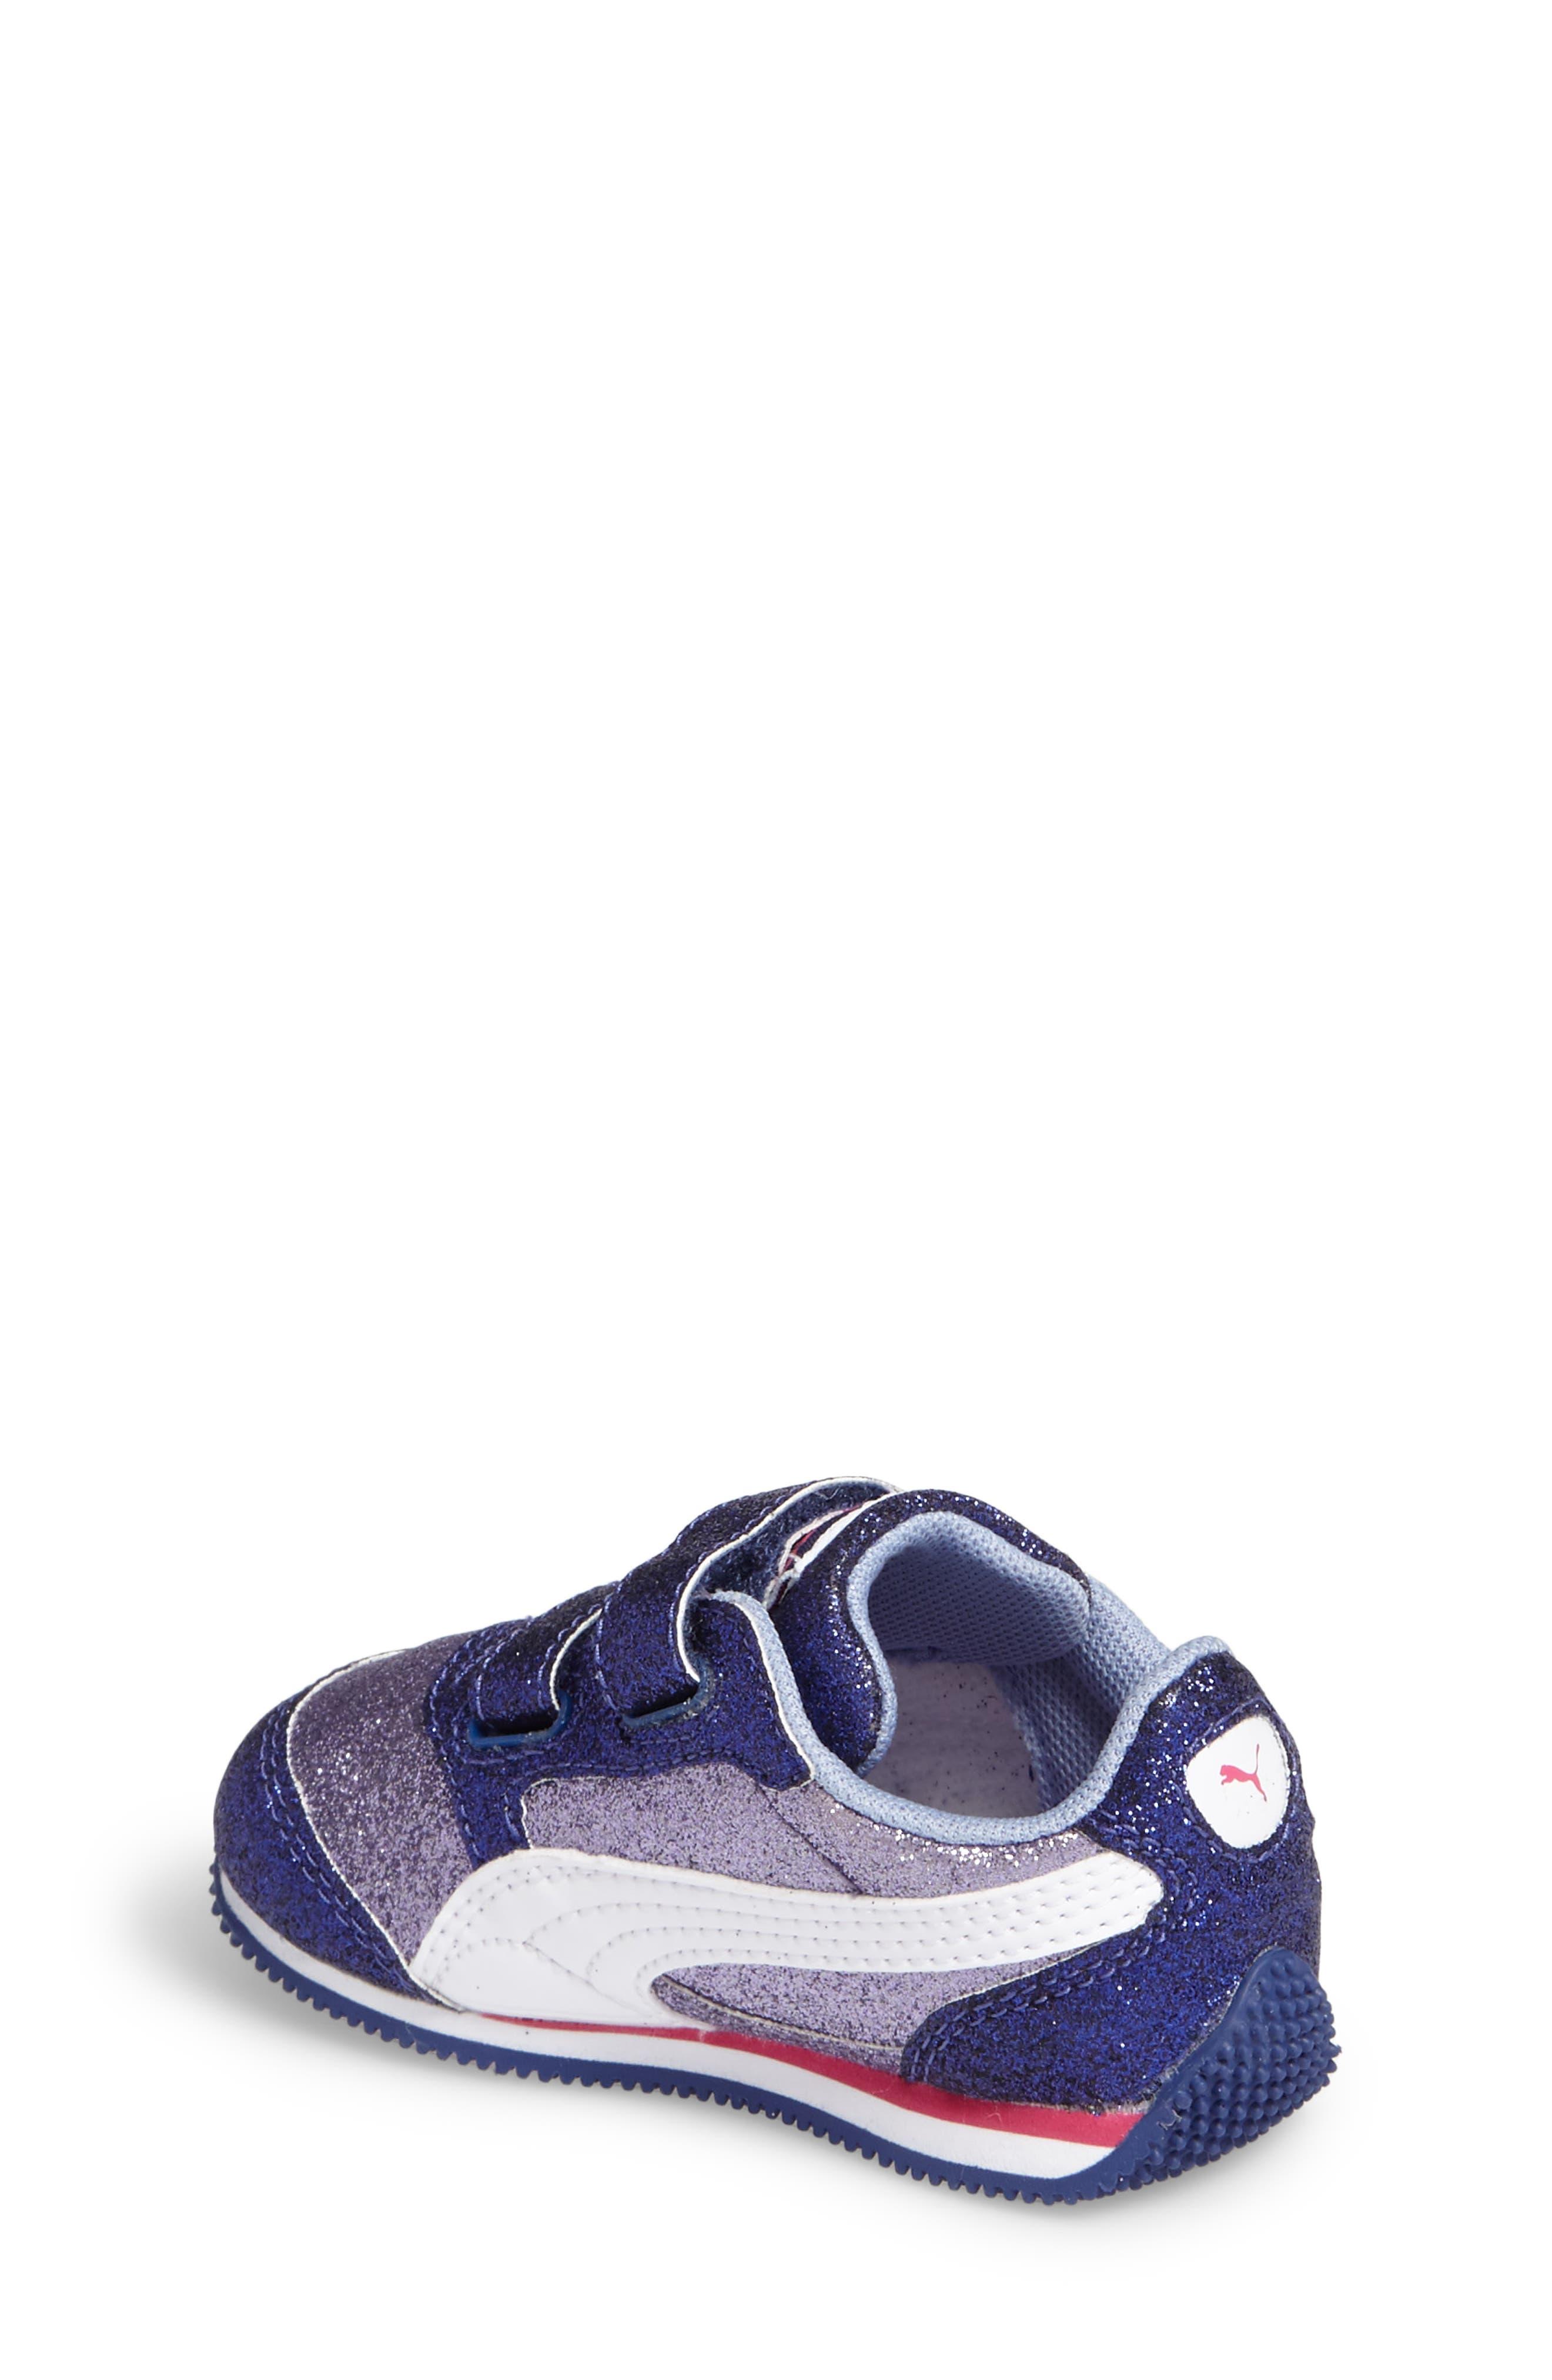 Steeple Glitz Glam Sneaker,                             Alternate thumbnail 2, color,                             500